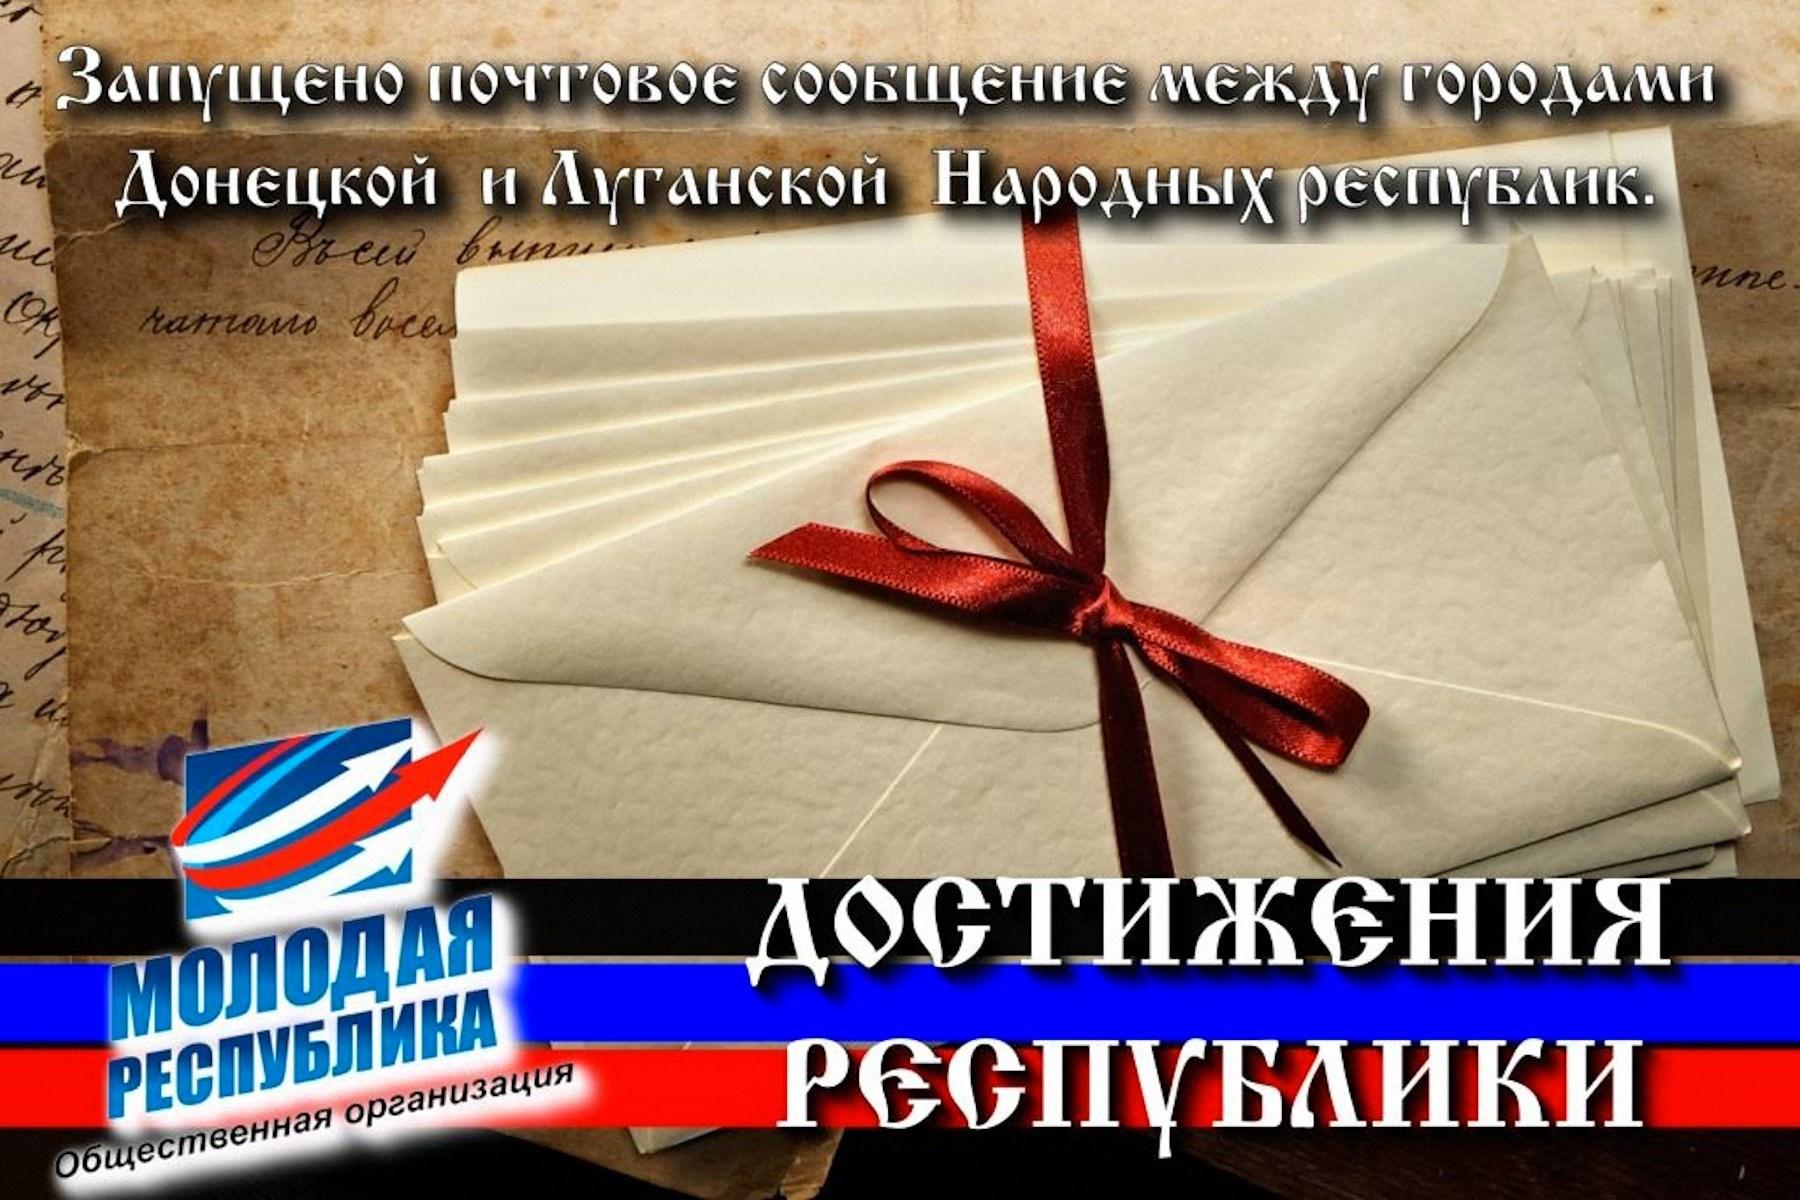 00 property of the republic dnr donetsk pr 08 280815